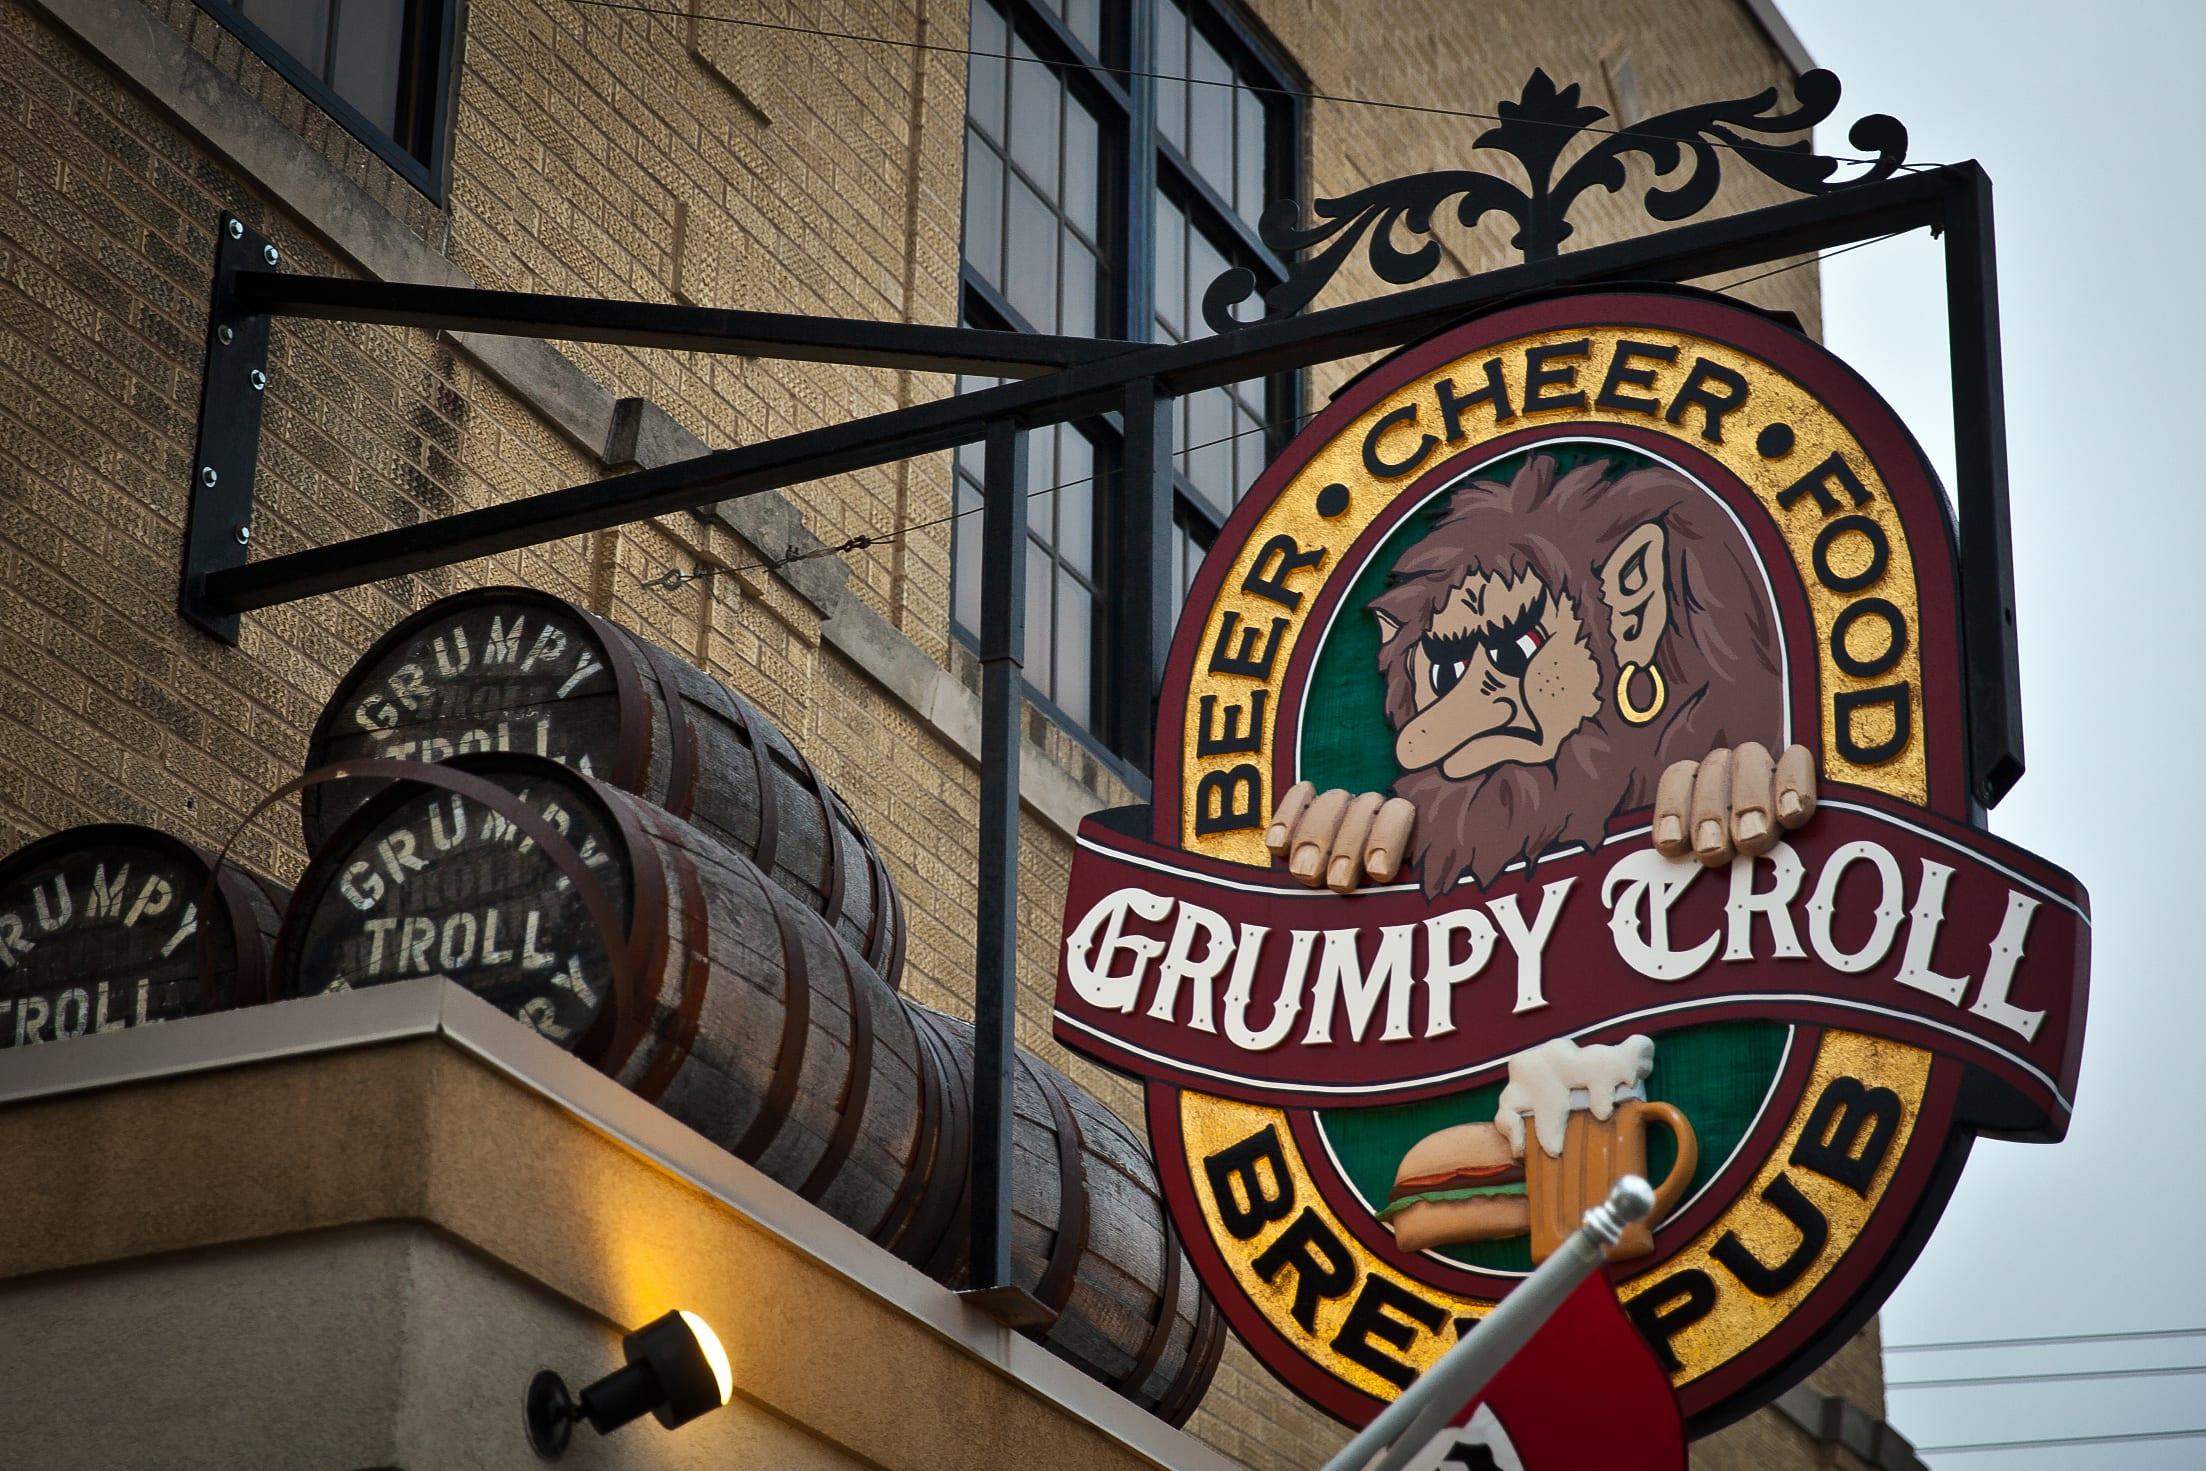 grumpy-troll-brewery-restaurant-mount-horeb-mt-horeb.jpg